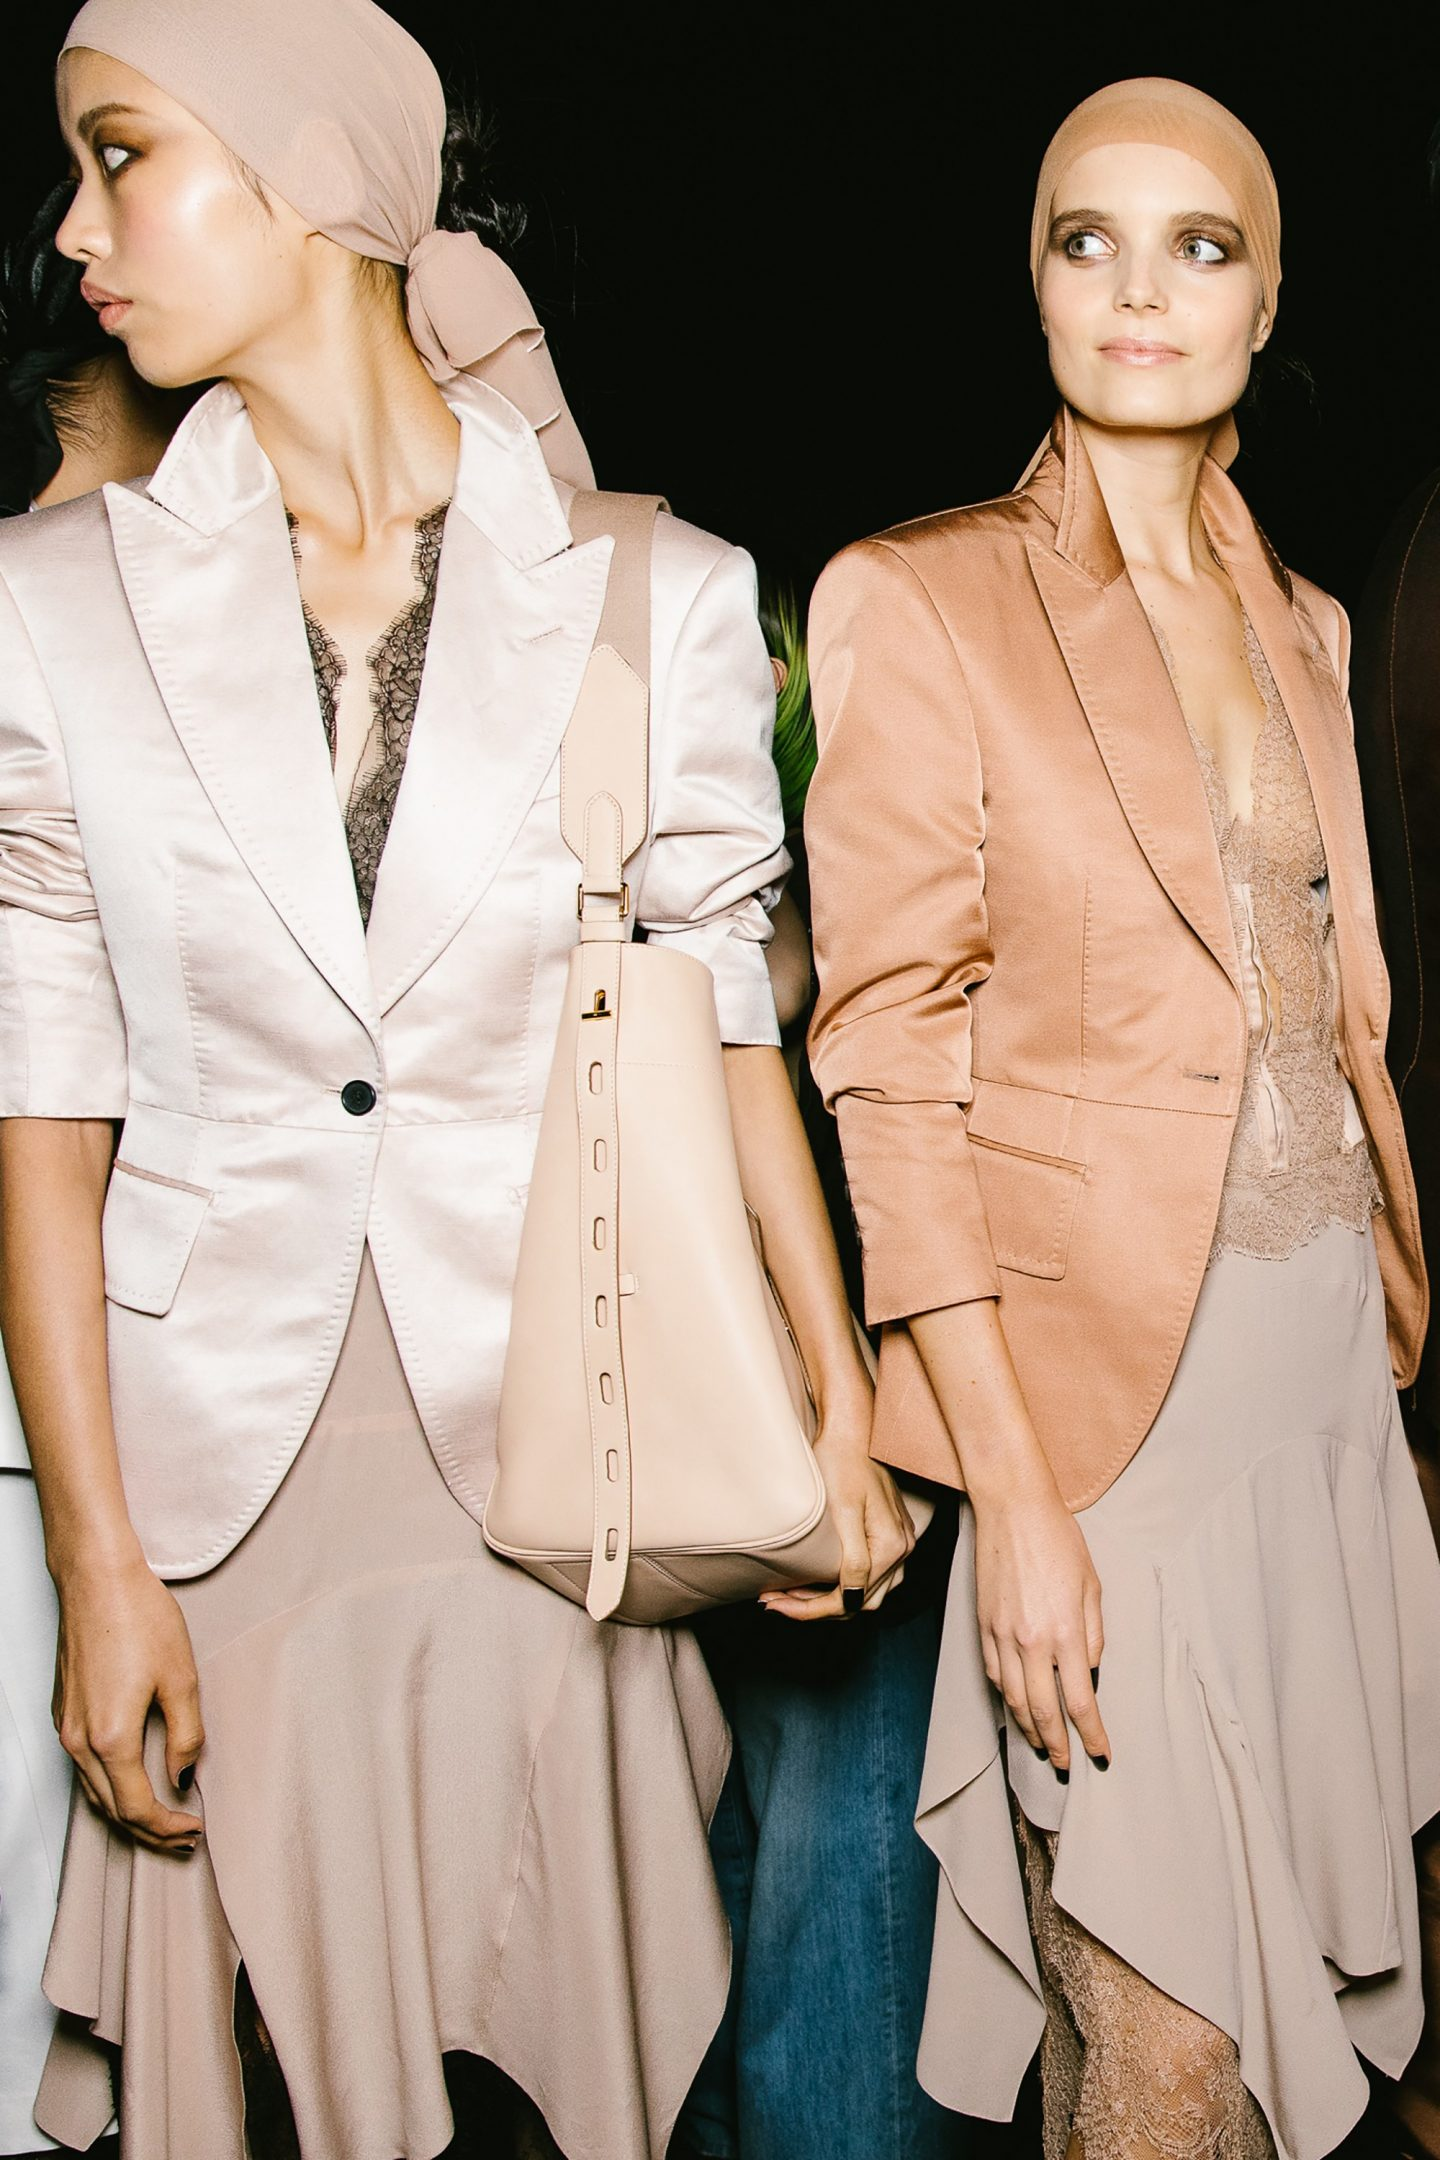 New York Fashion Week. Corey Tenold